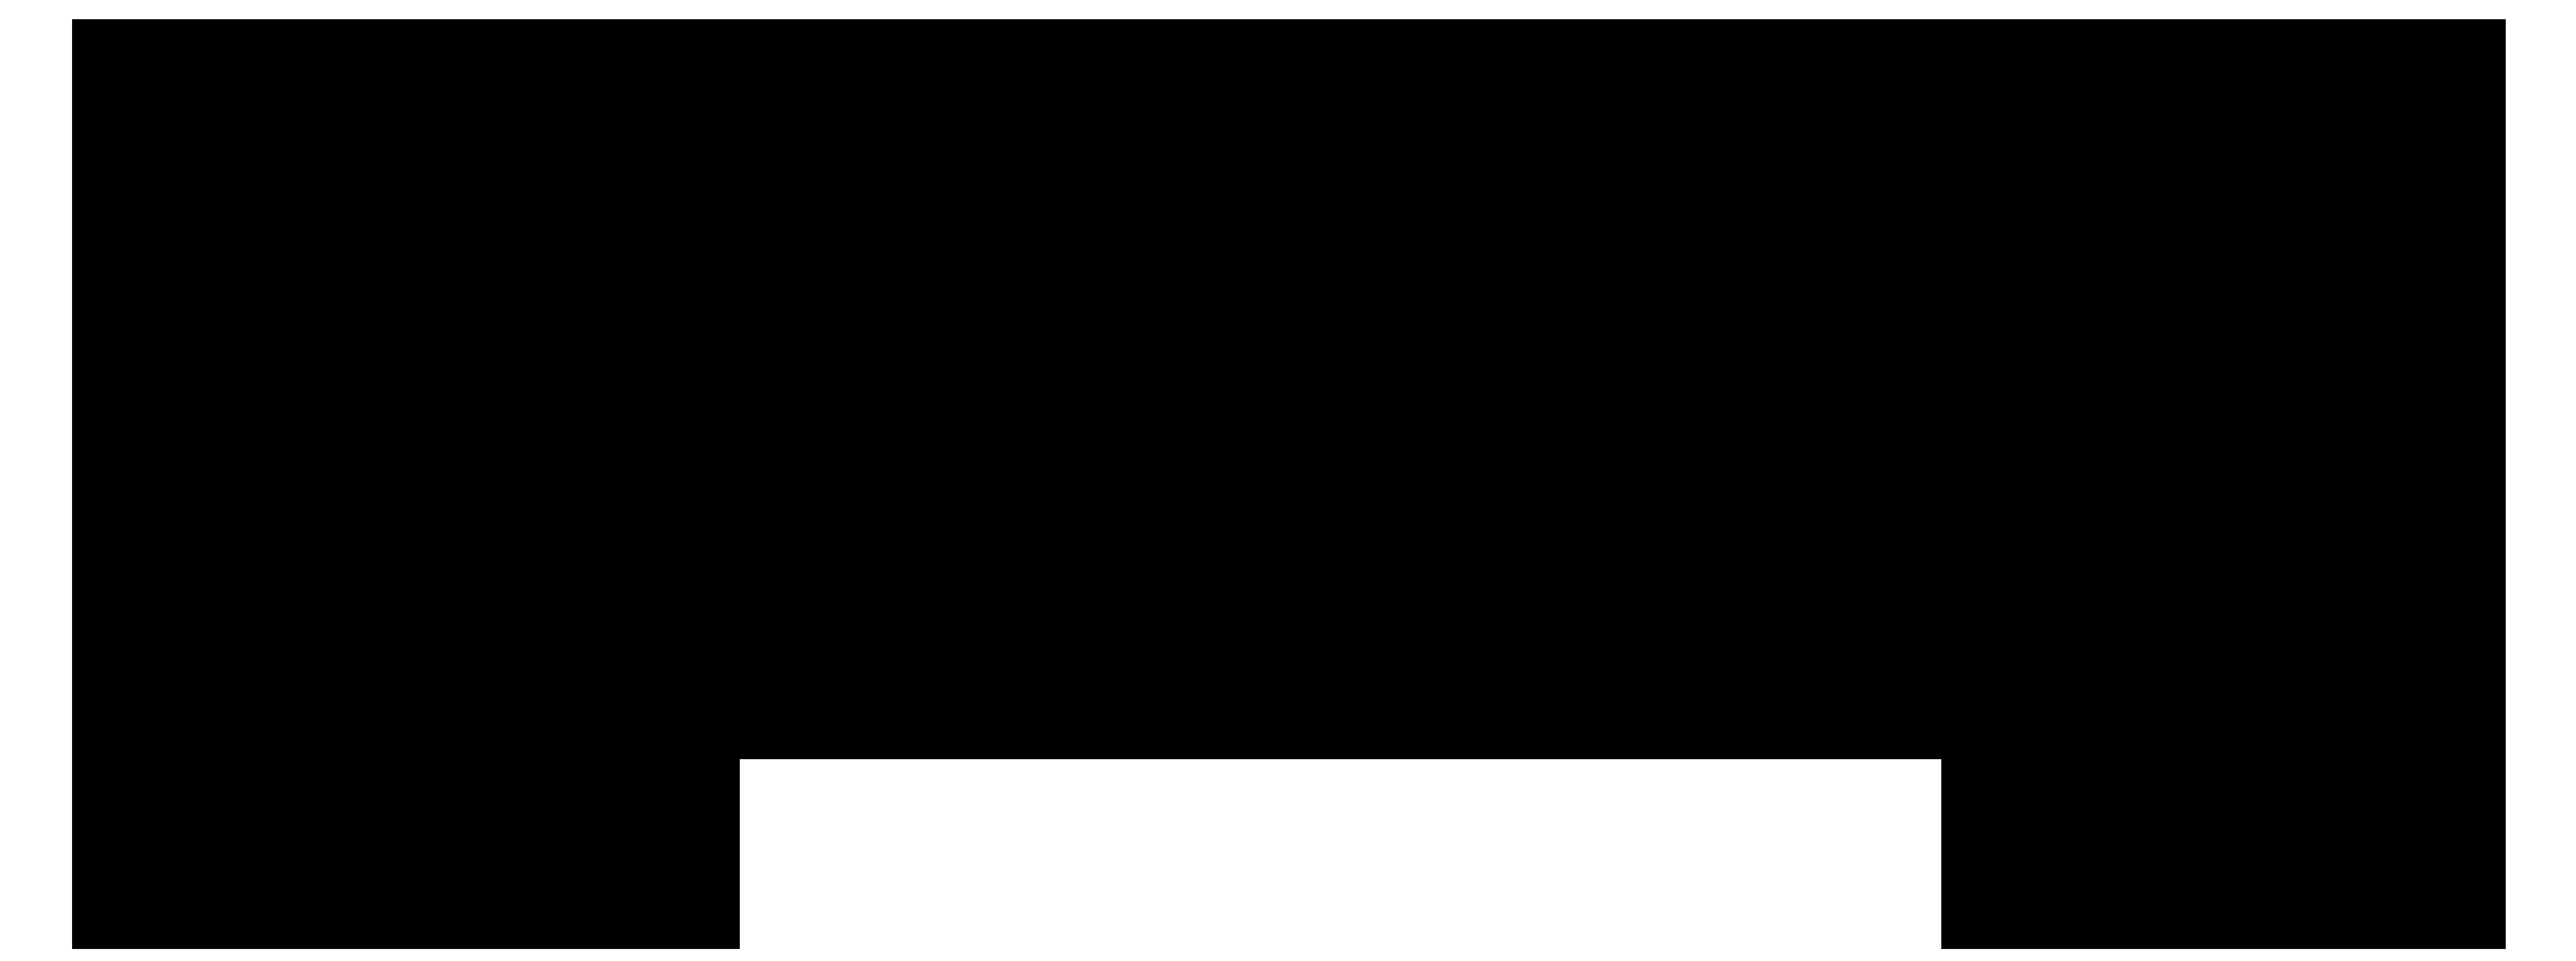 Hallmark channel logo clipart graphic royalty free stock Hallmark Channel – Logos Download graphic royalty free stock